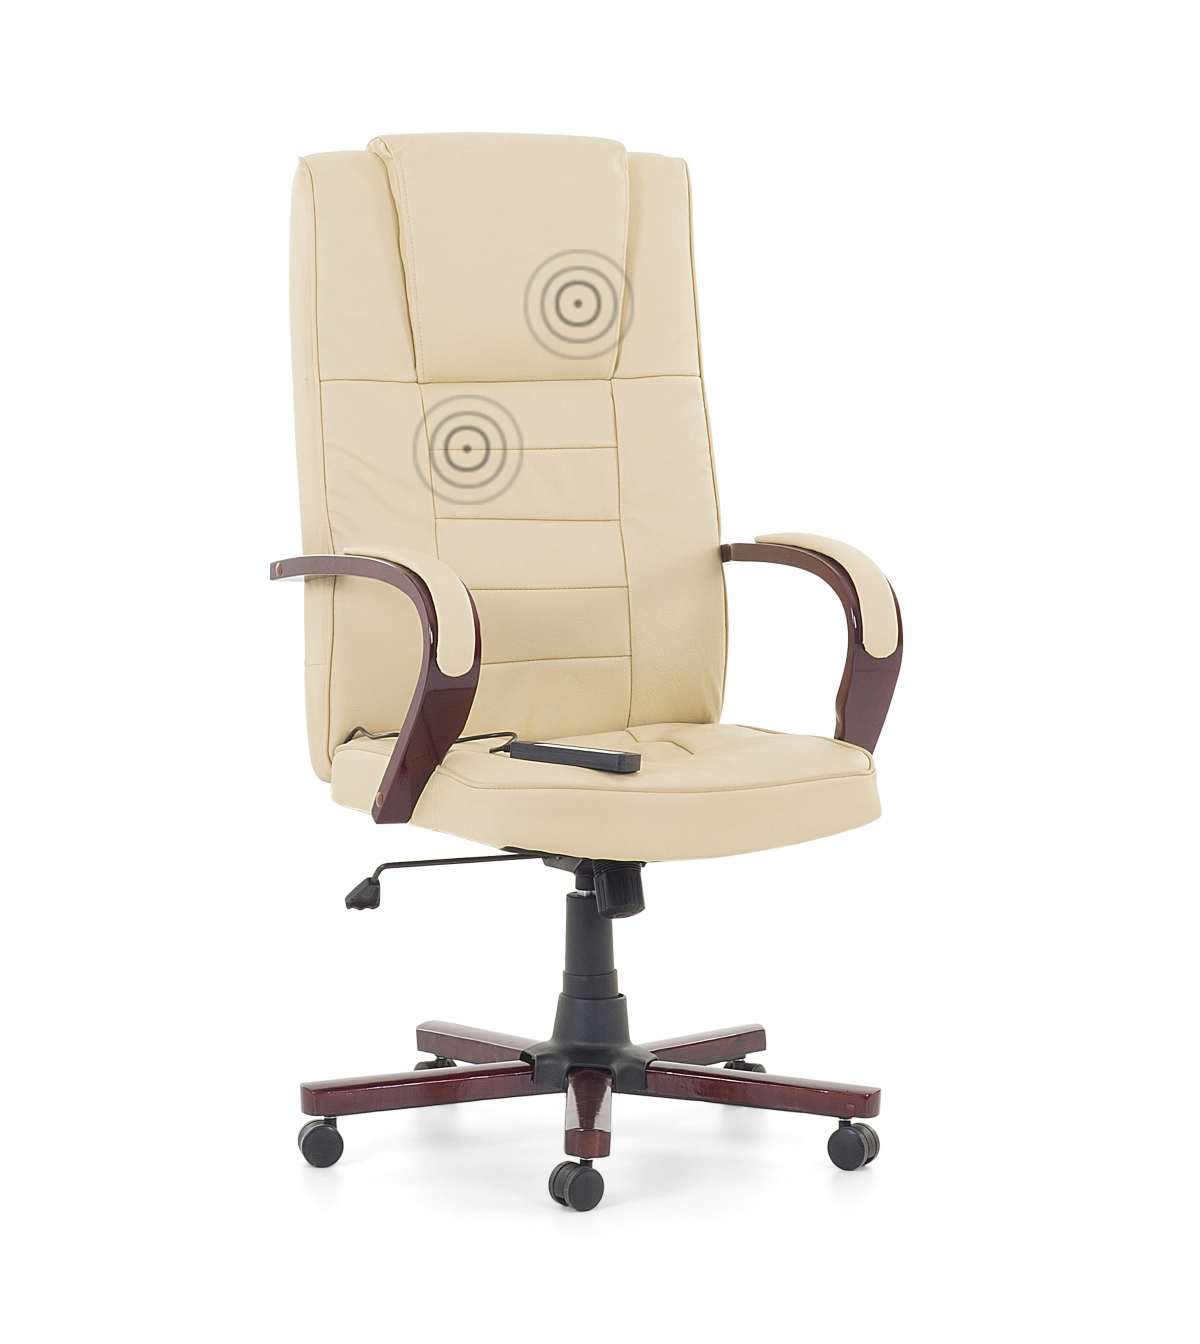 Leder Chefsessel Massagesessel San Diego Holz Bürosessel Creme Weiß